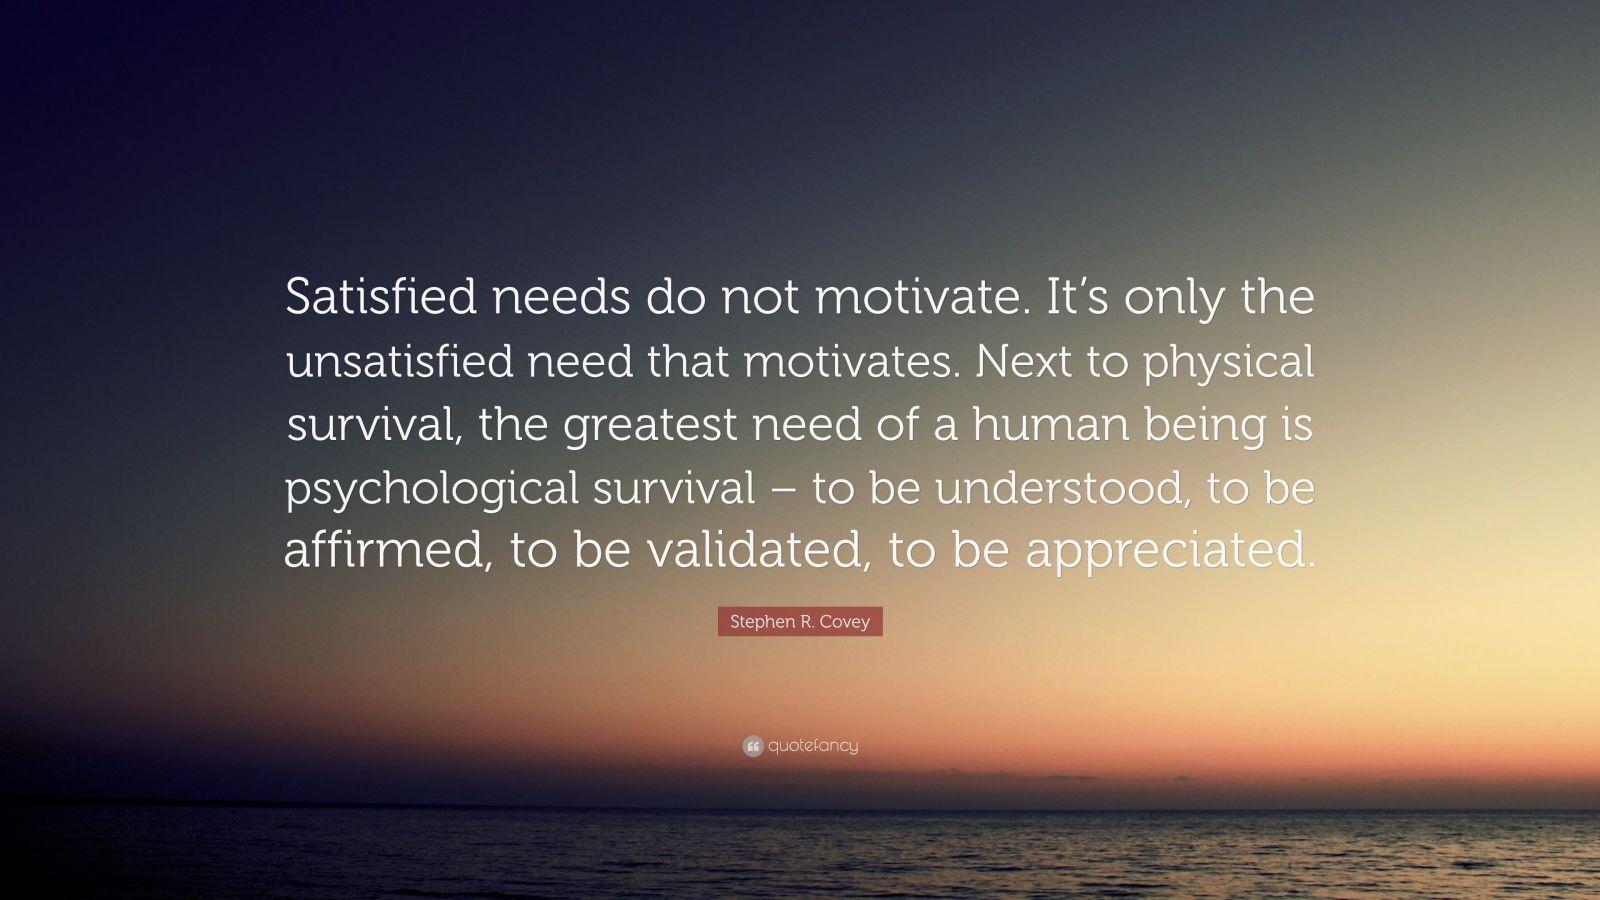 motivators that do not motivate the